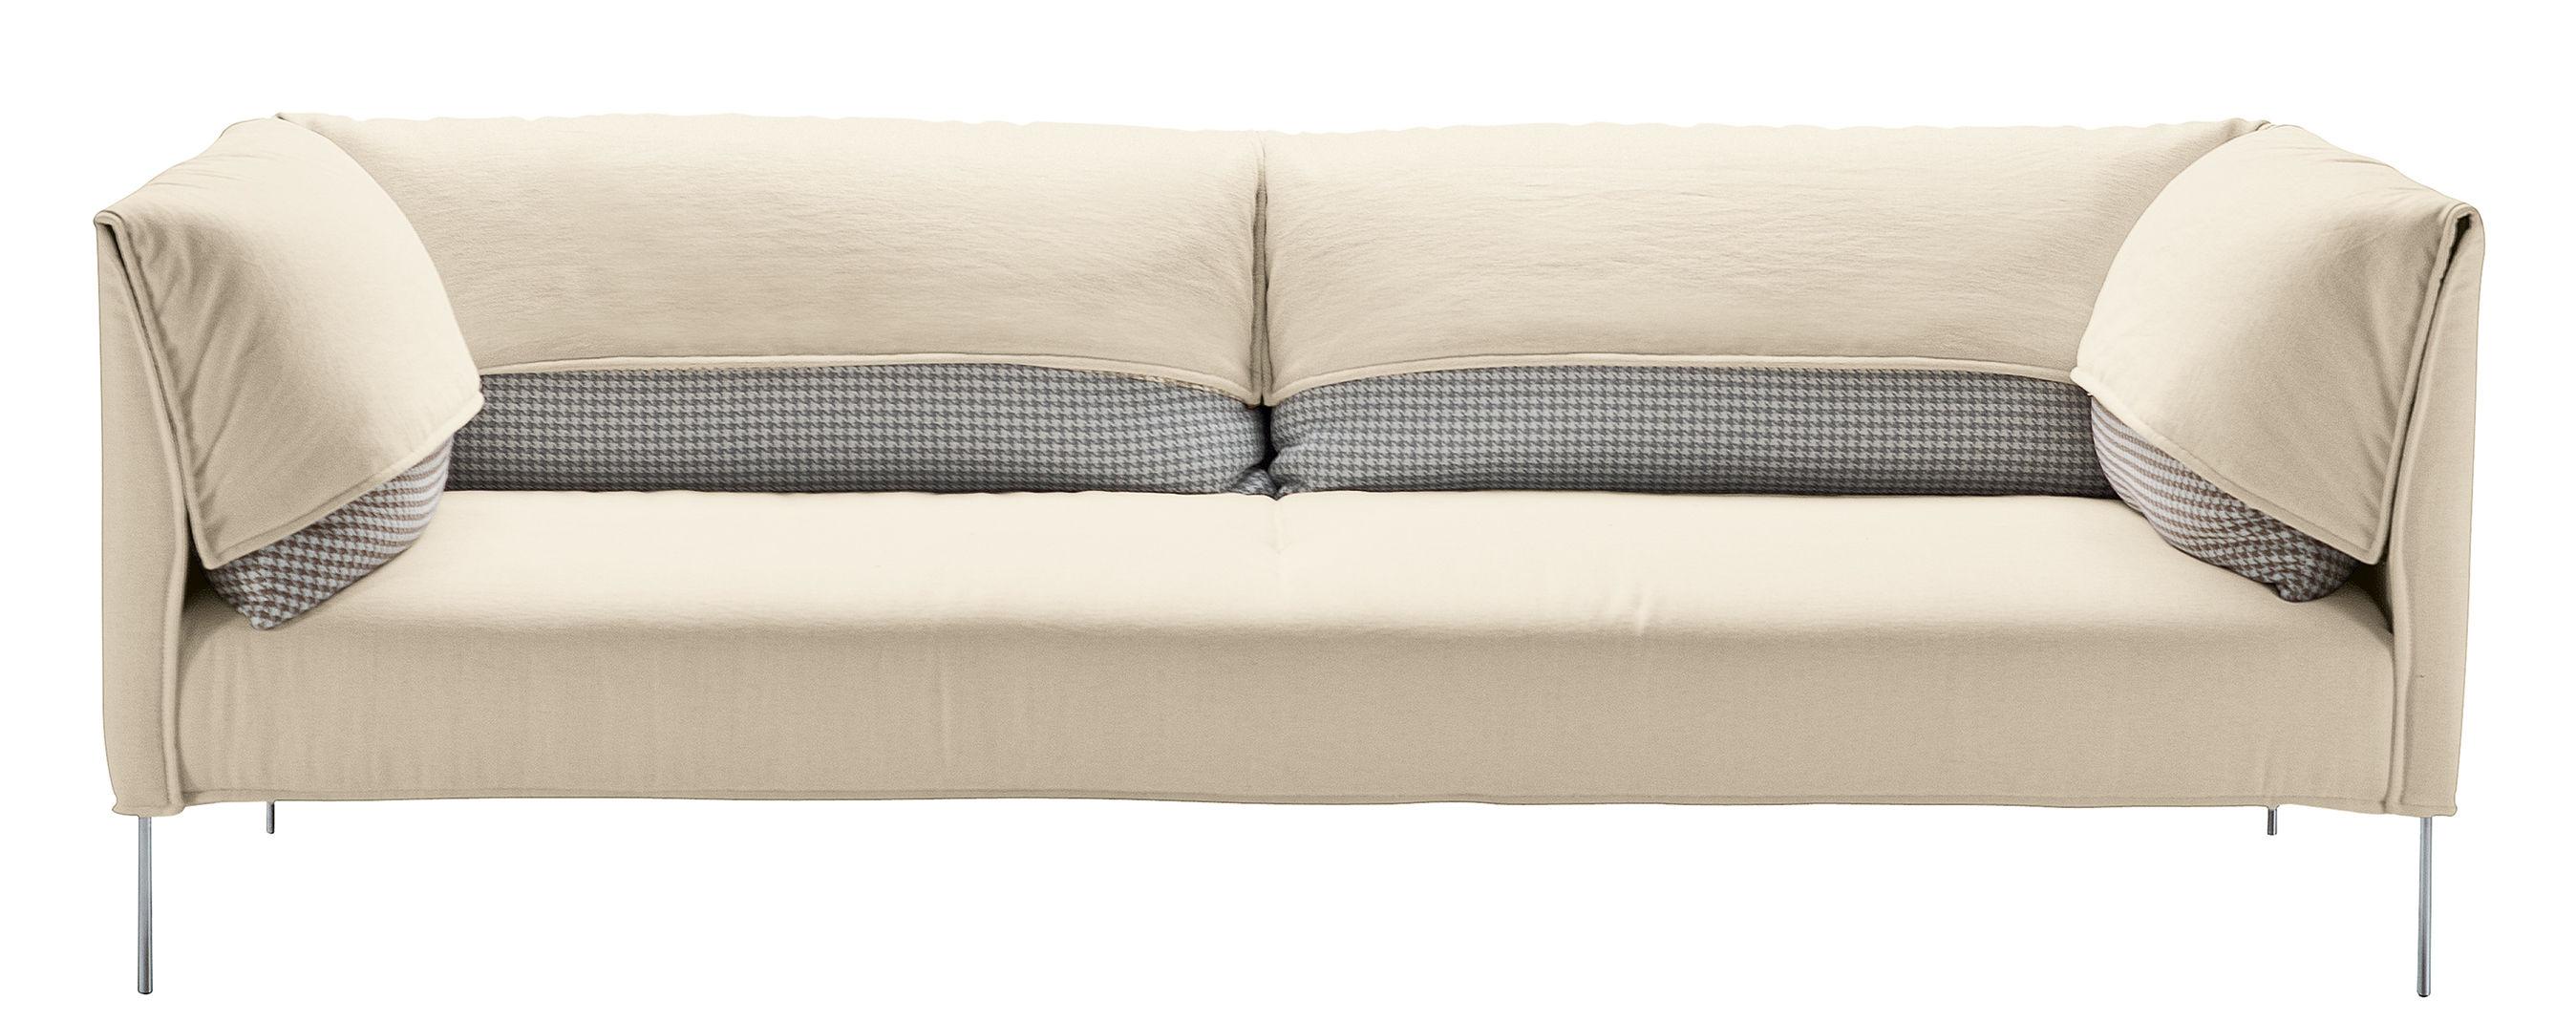 undercover 2 sitzer l 187 cm zanotta sofa. Black Bedroom Furniture Sets. Home Design Ideas